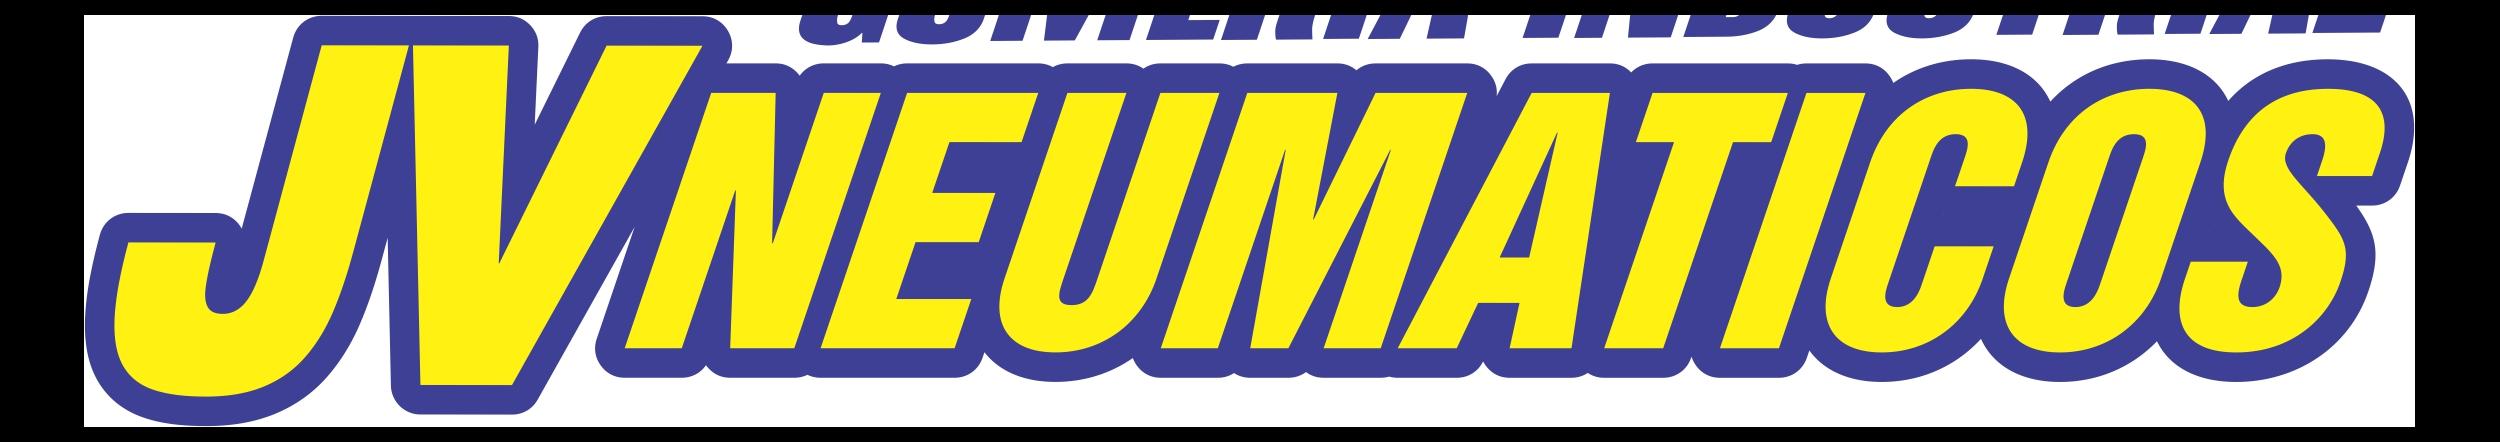 JV Neumáticos